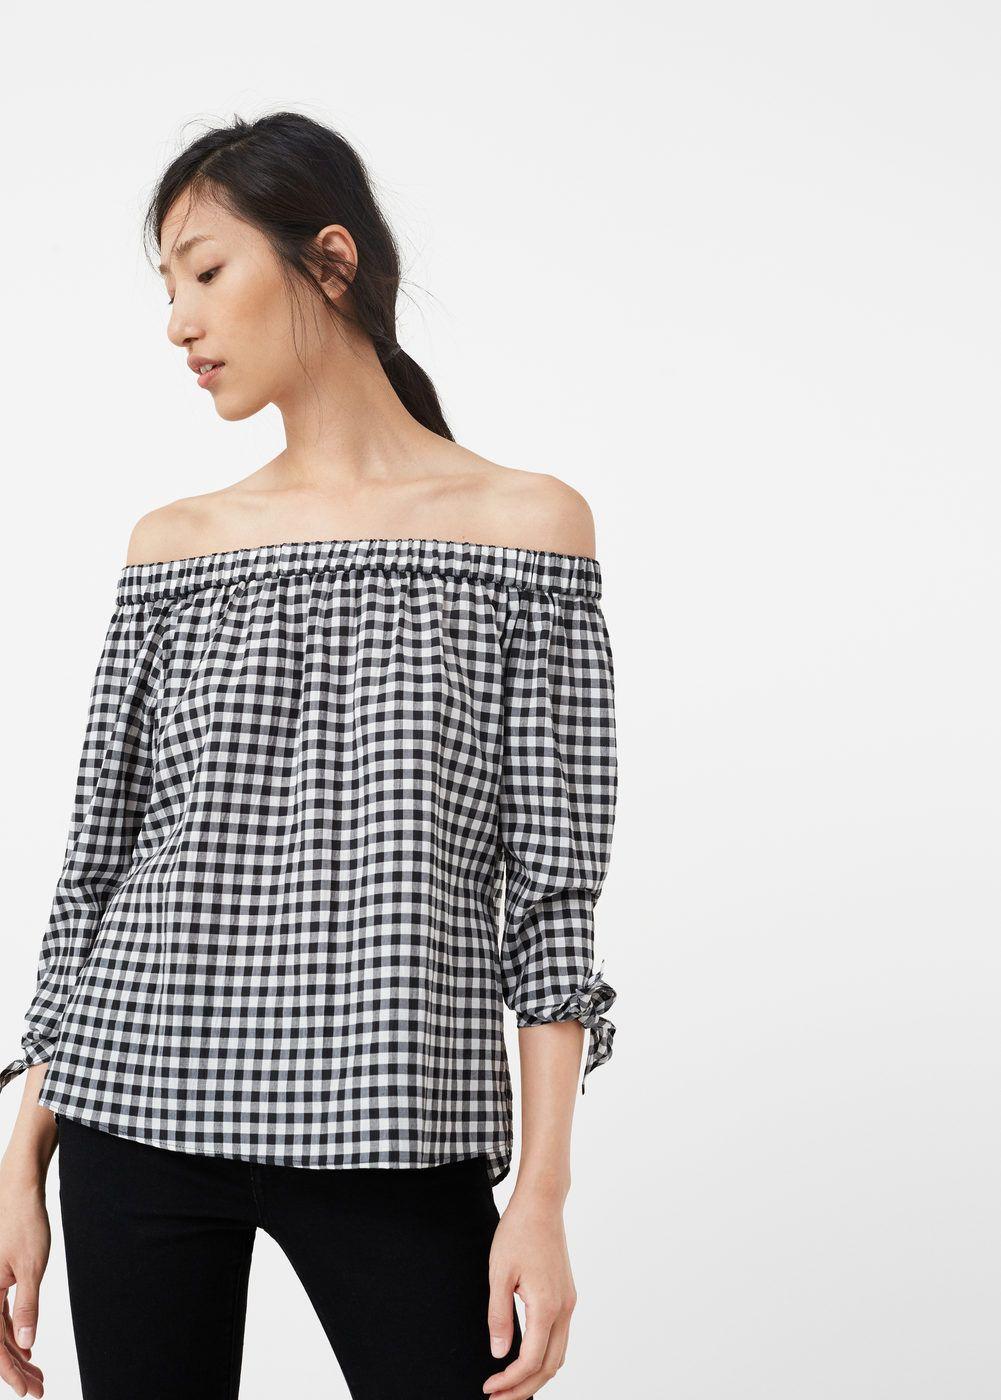 c5b062ce4a773 Blusa off shoulder - Camisas de Mujer